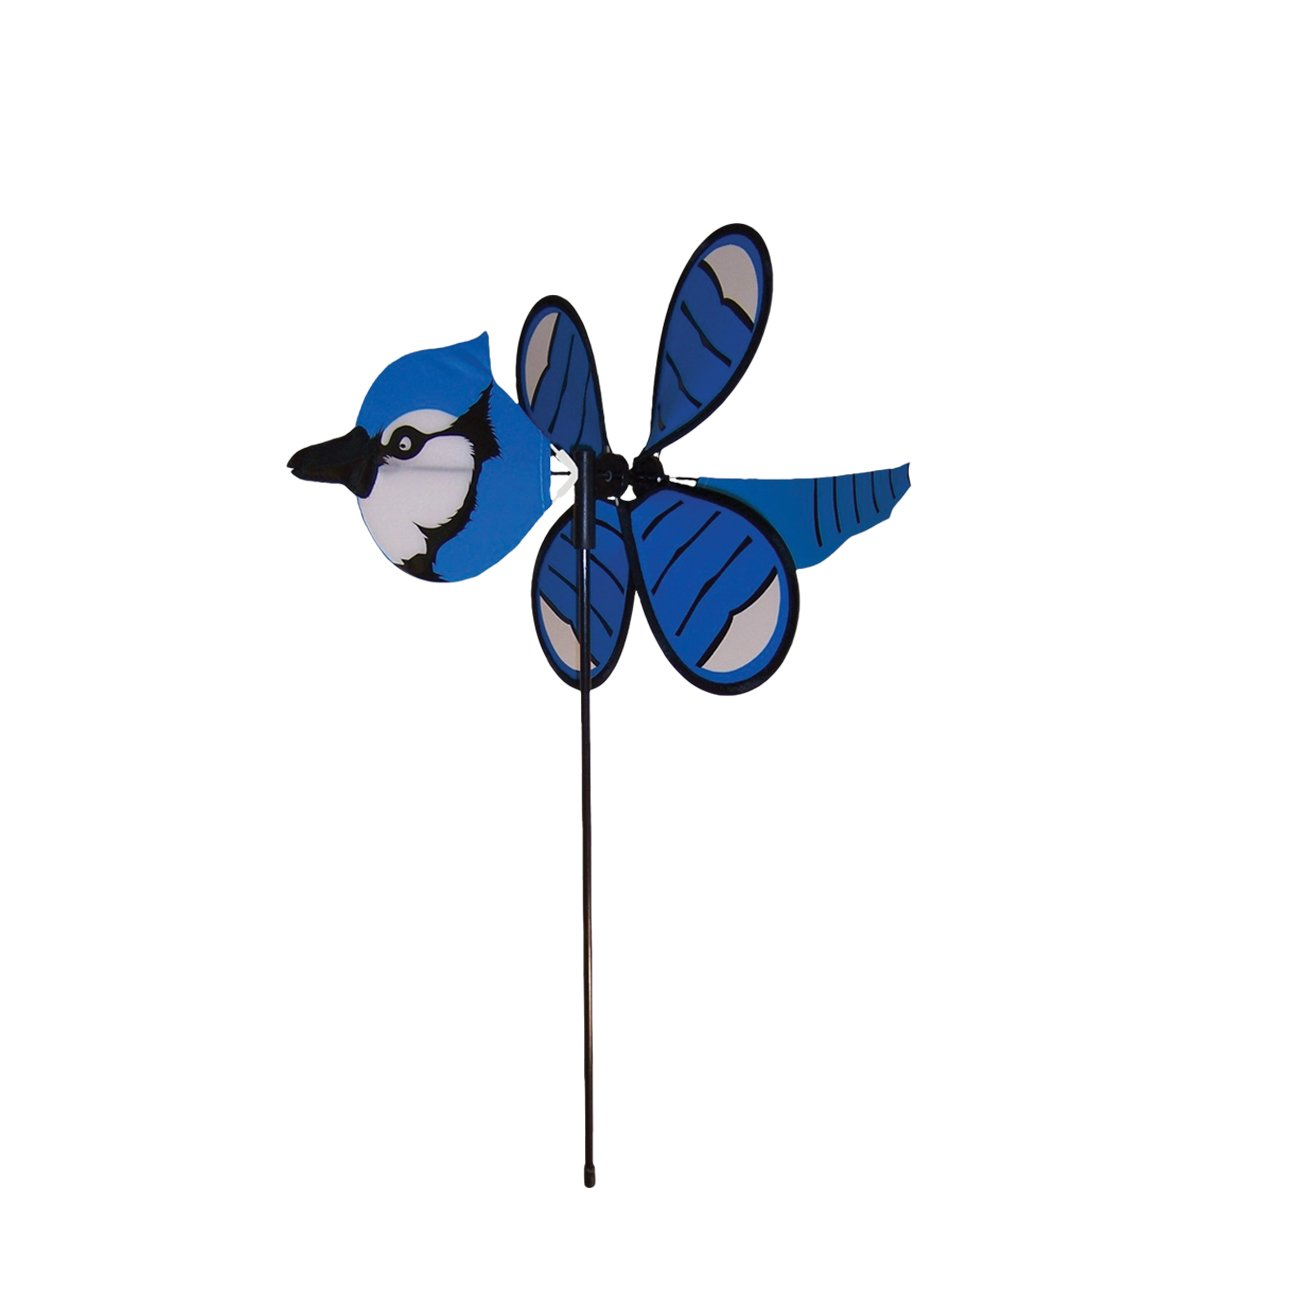 In the Breeze Baby Blue Jay Garden Spinner